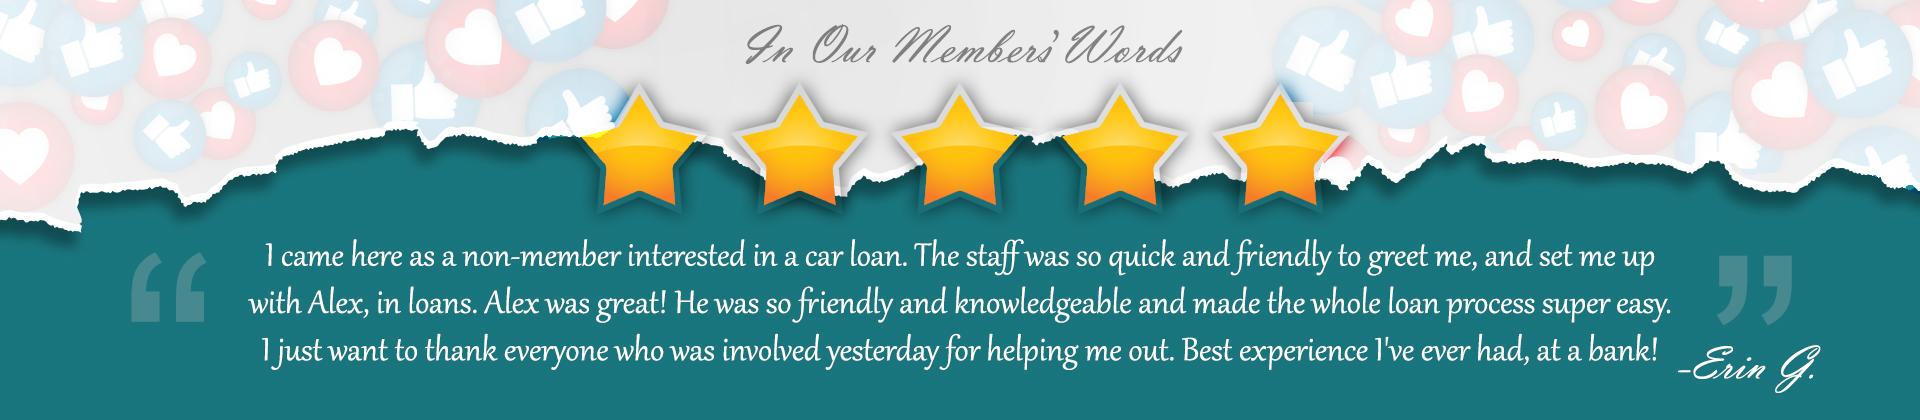 golden 1 credit union auto loan online payment займ на карту до 30000 т сразу на карту